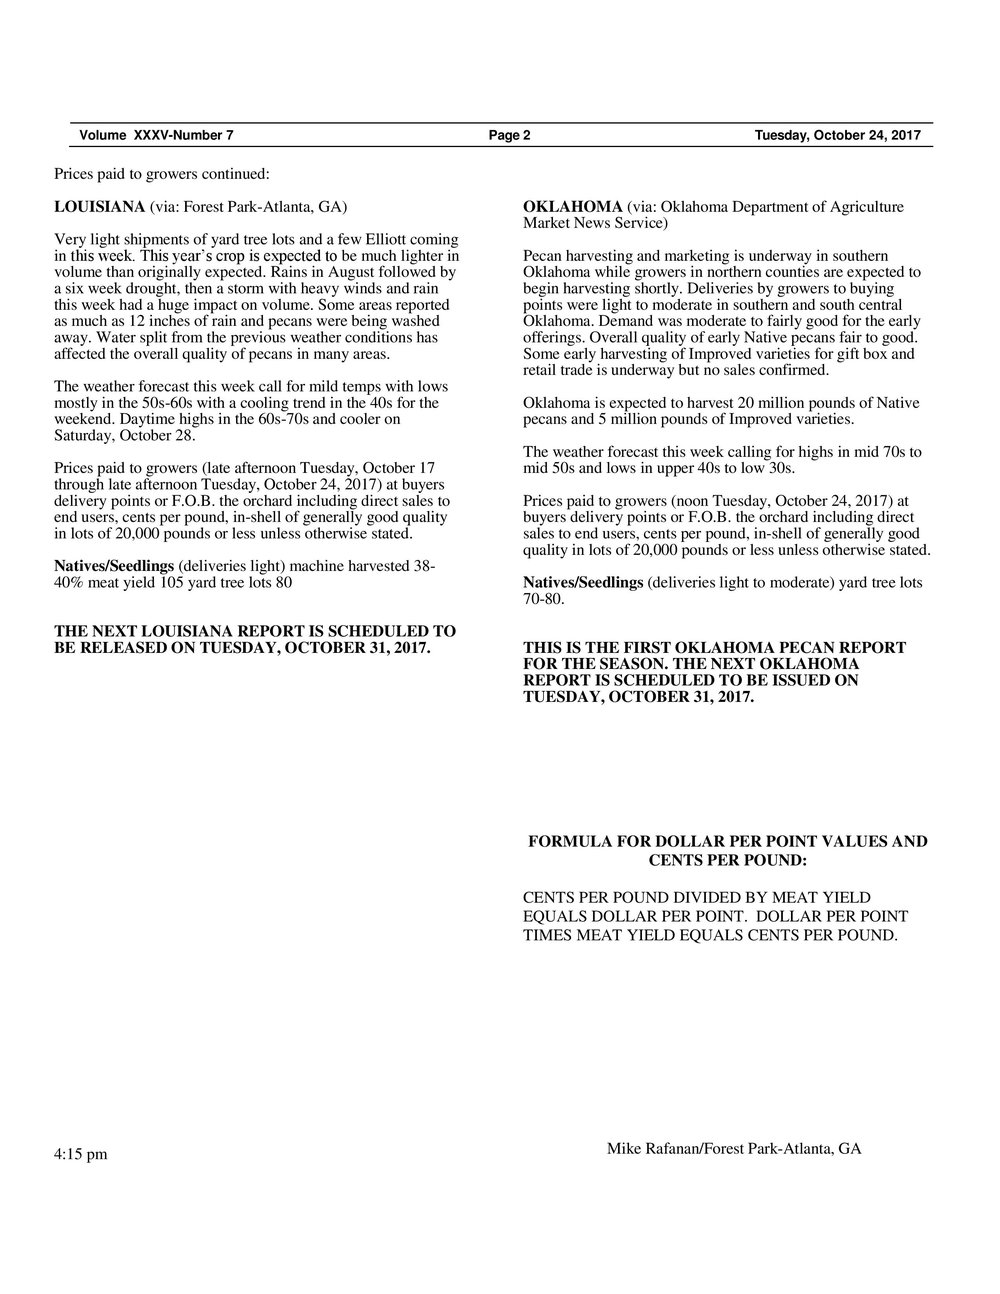 usda pecan report 10-24-17-page-002.jpg